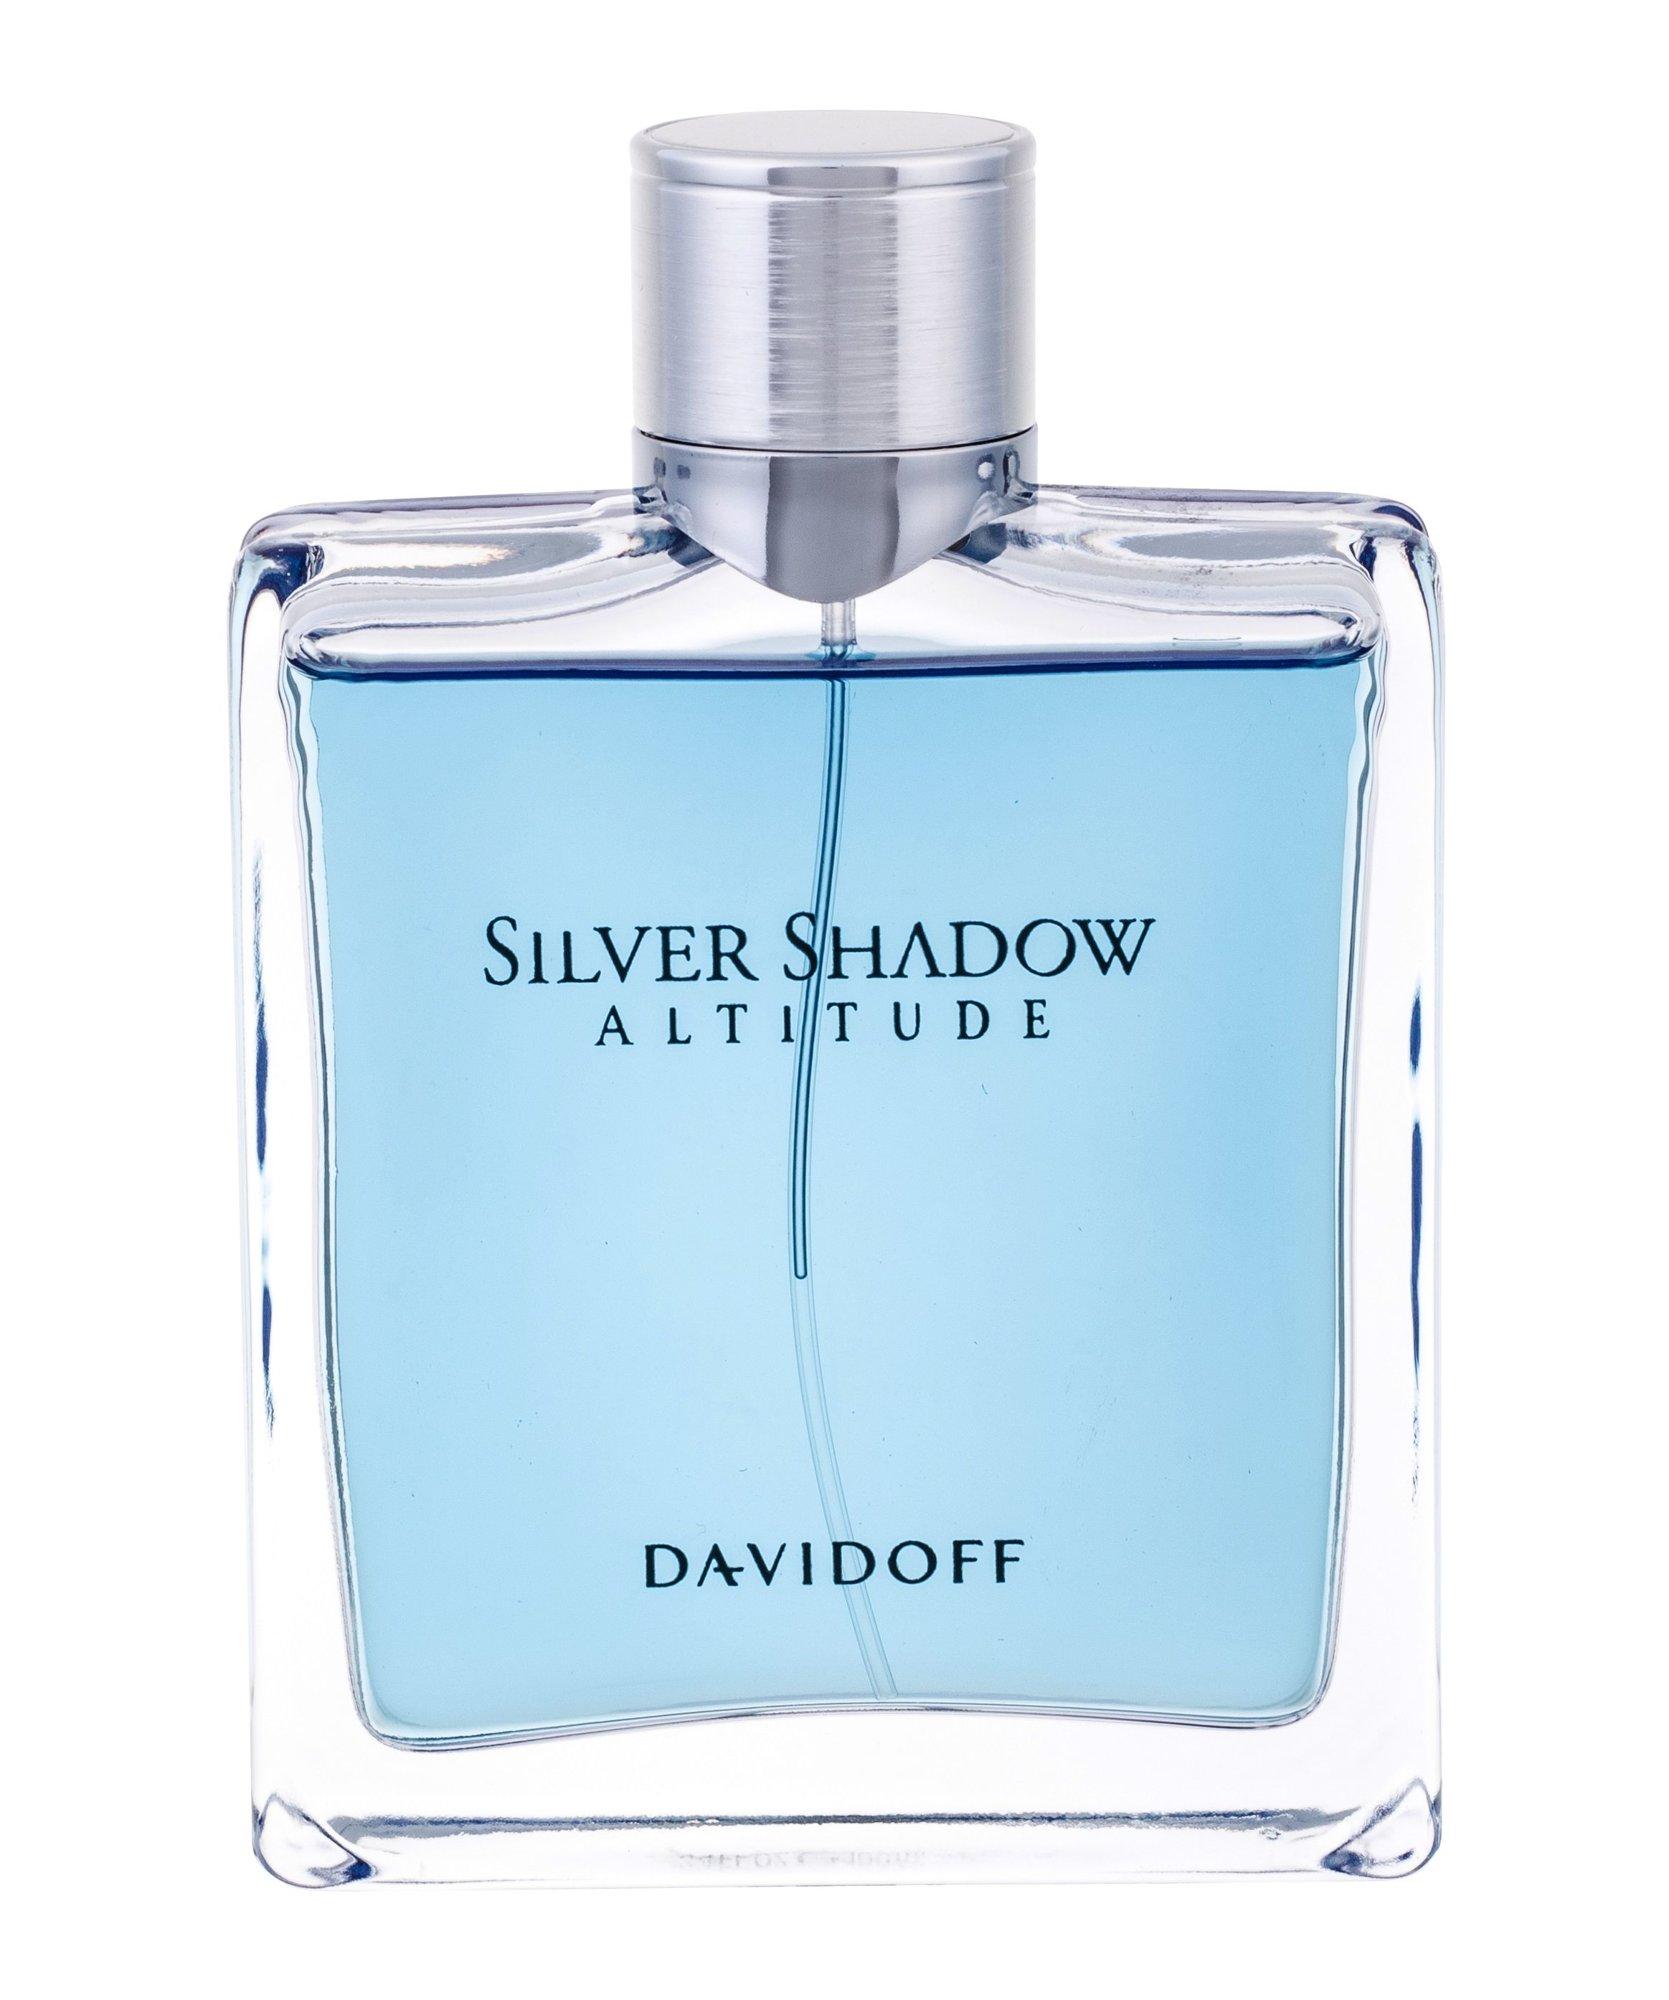 Davidoff Silver Shadow Altitude, Toaletní voda 100ml